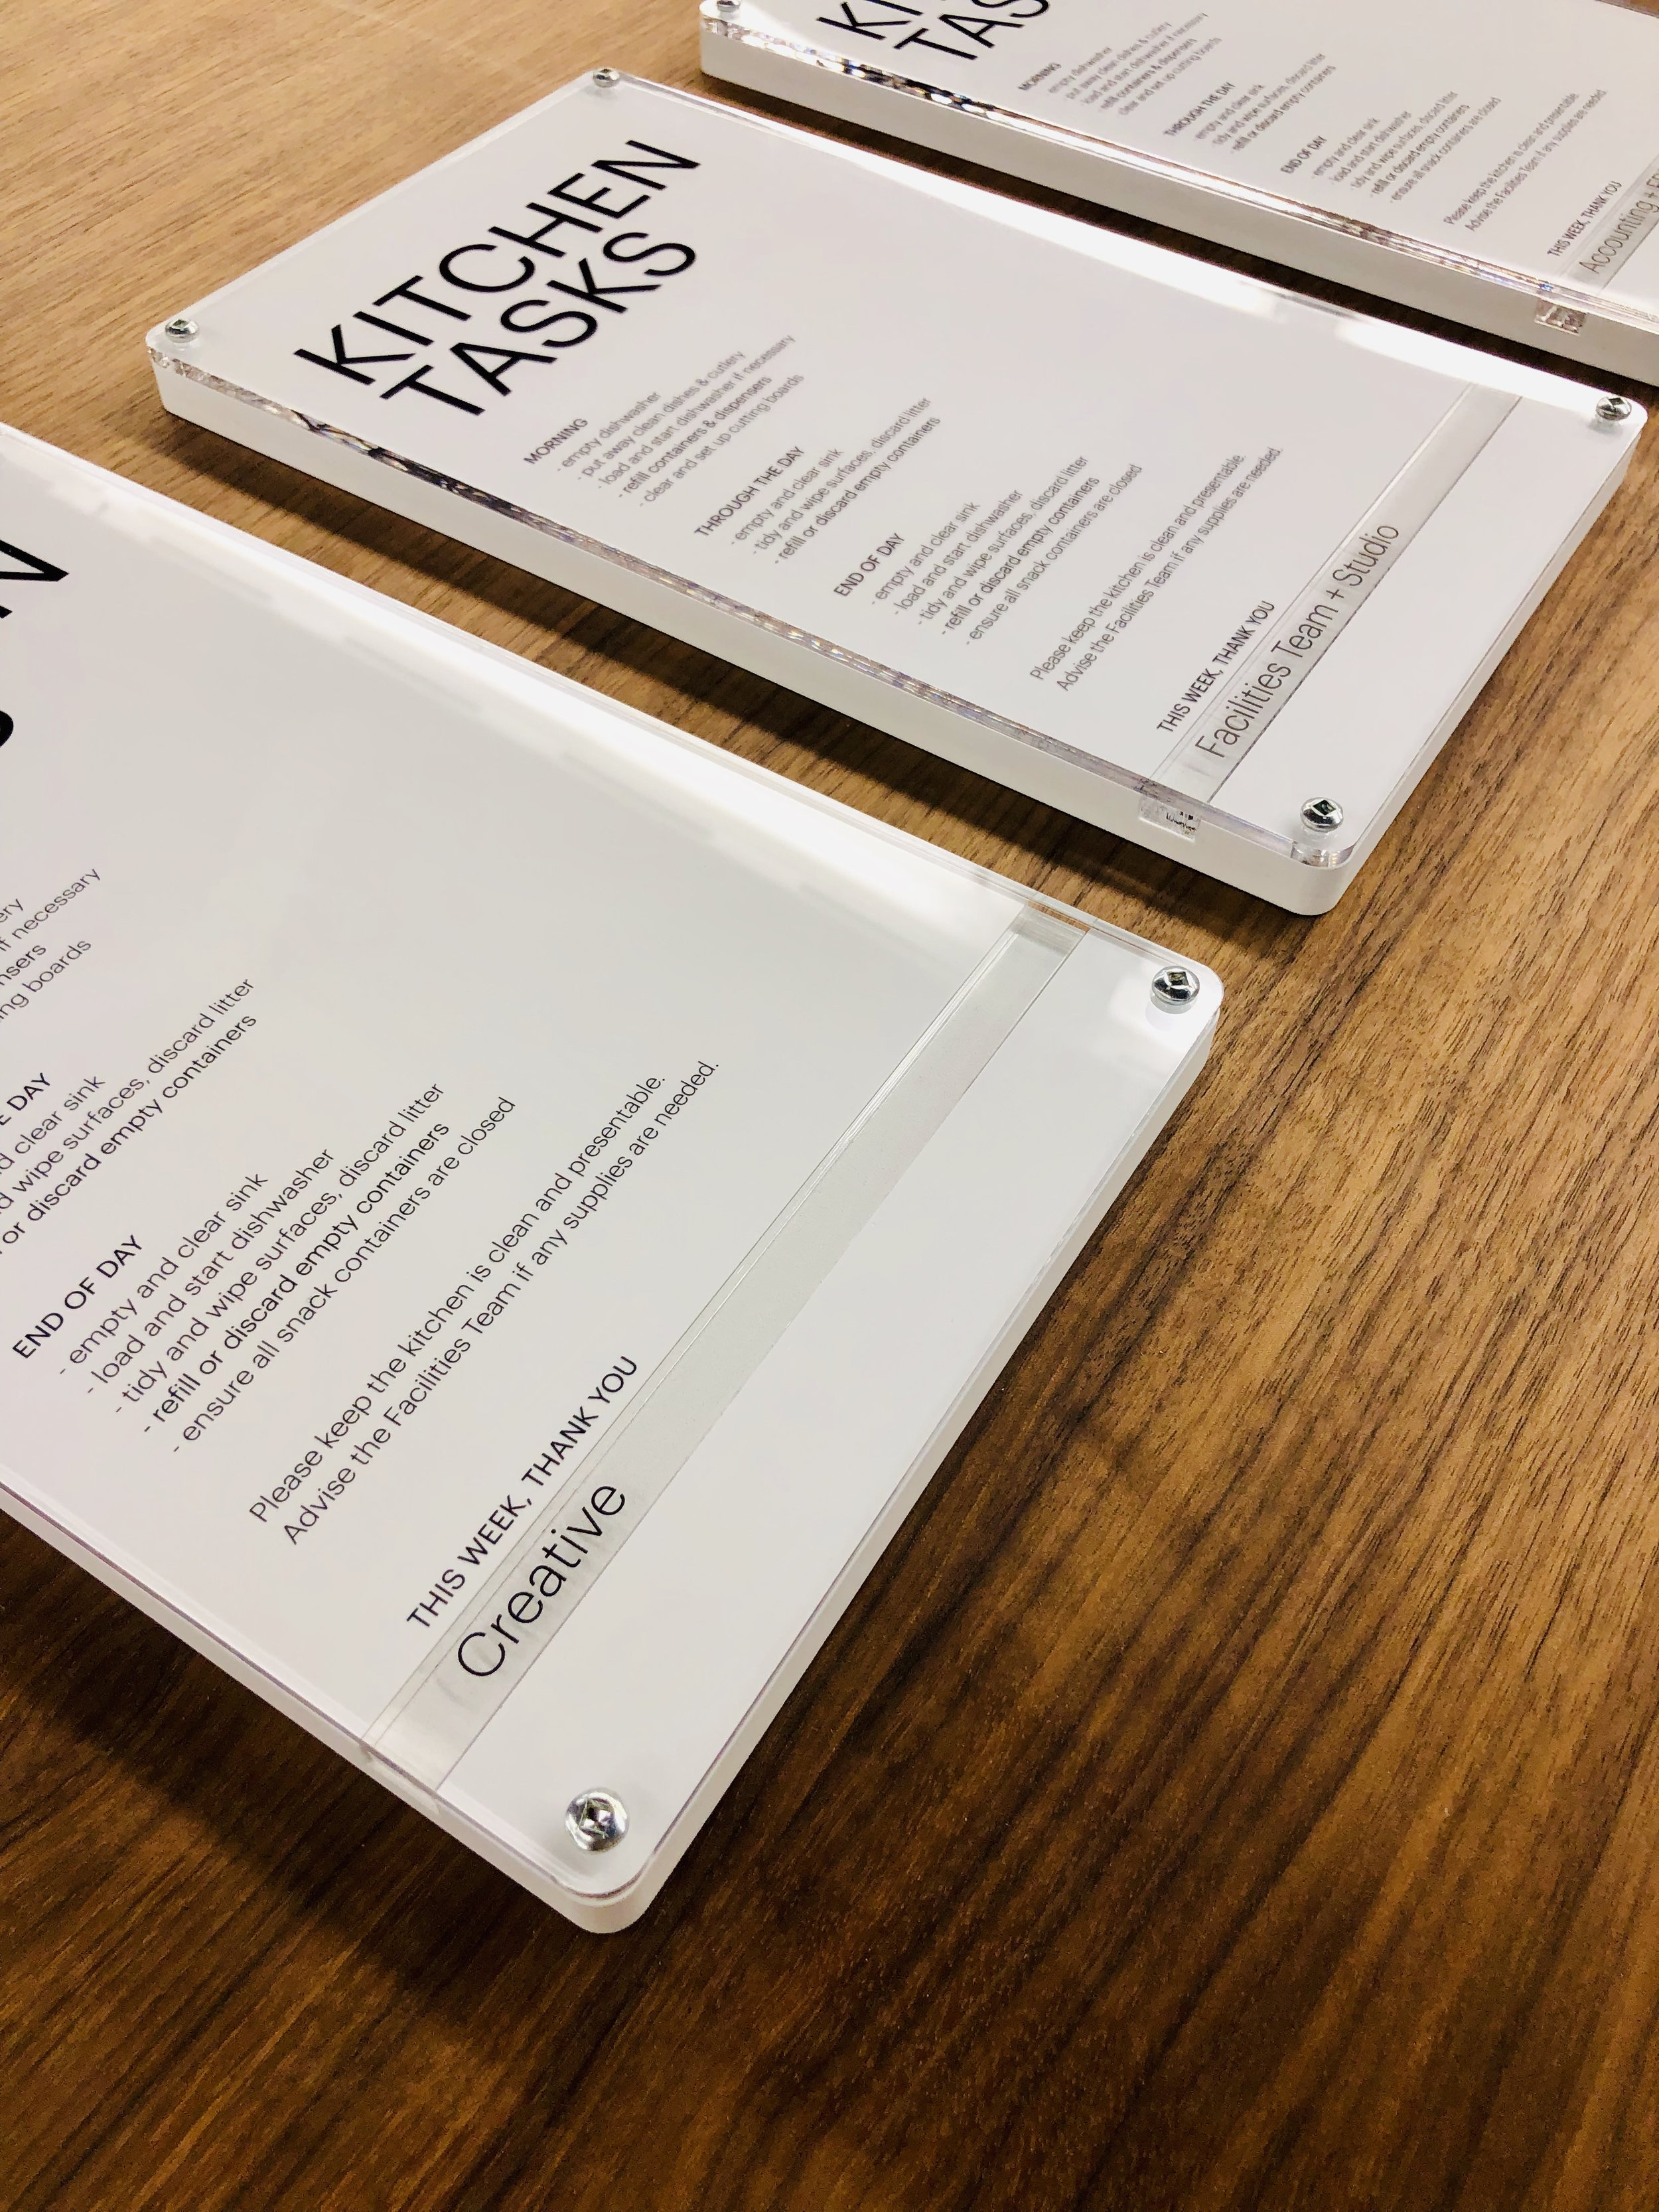 Custom acrylic business signs by Klo Lab.jpeg